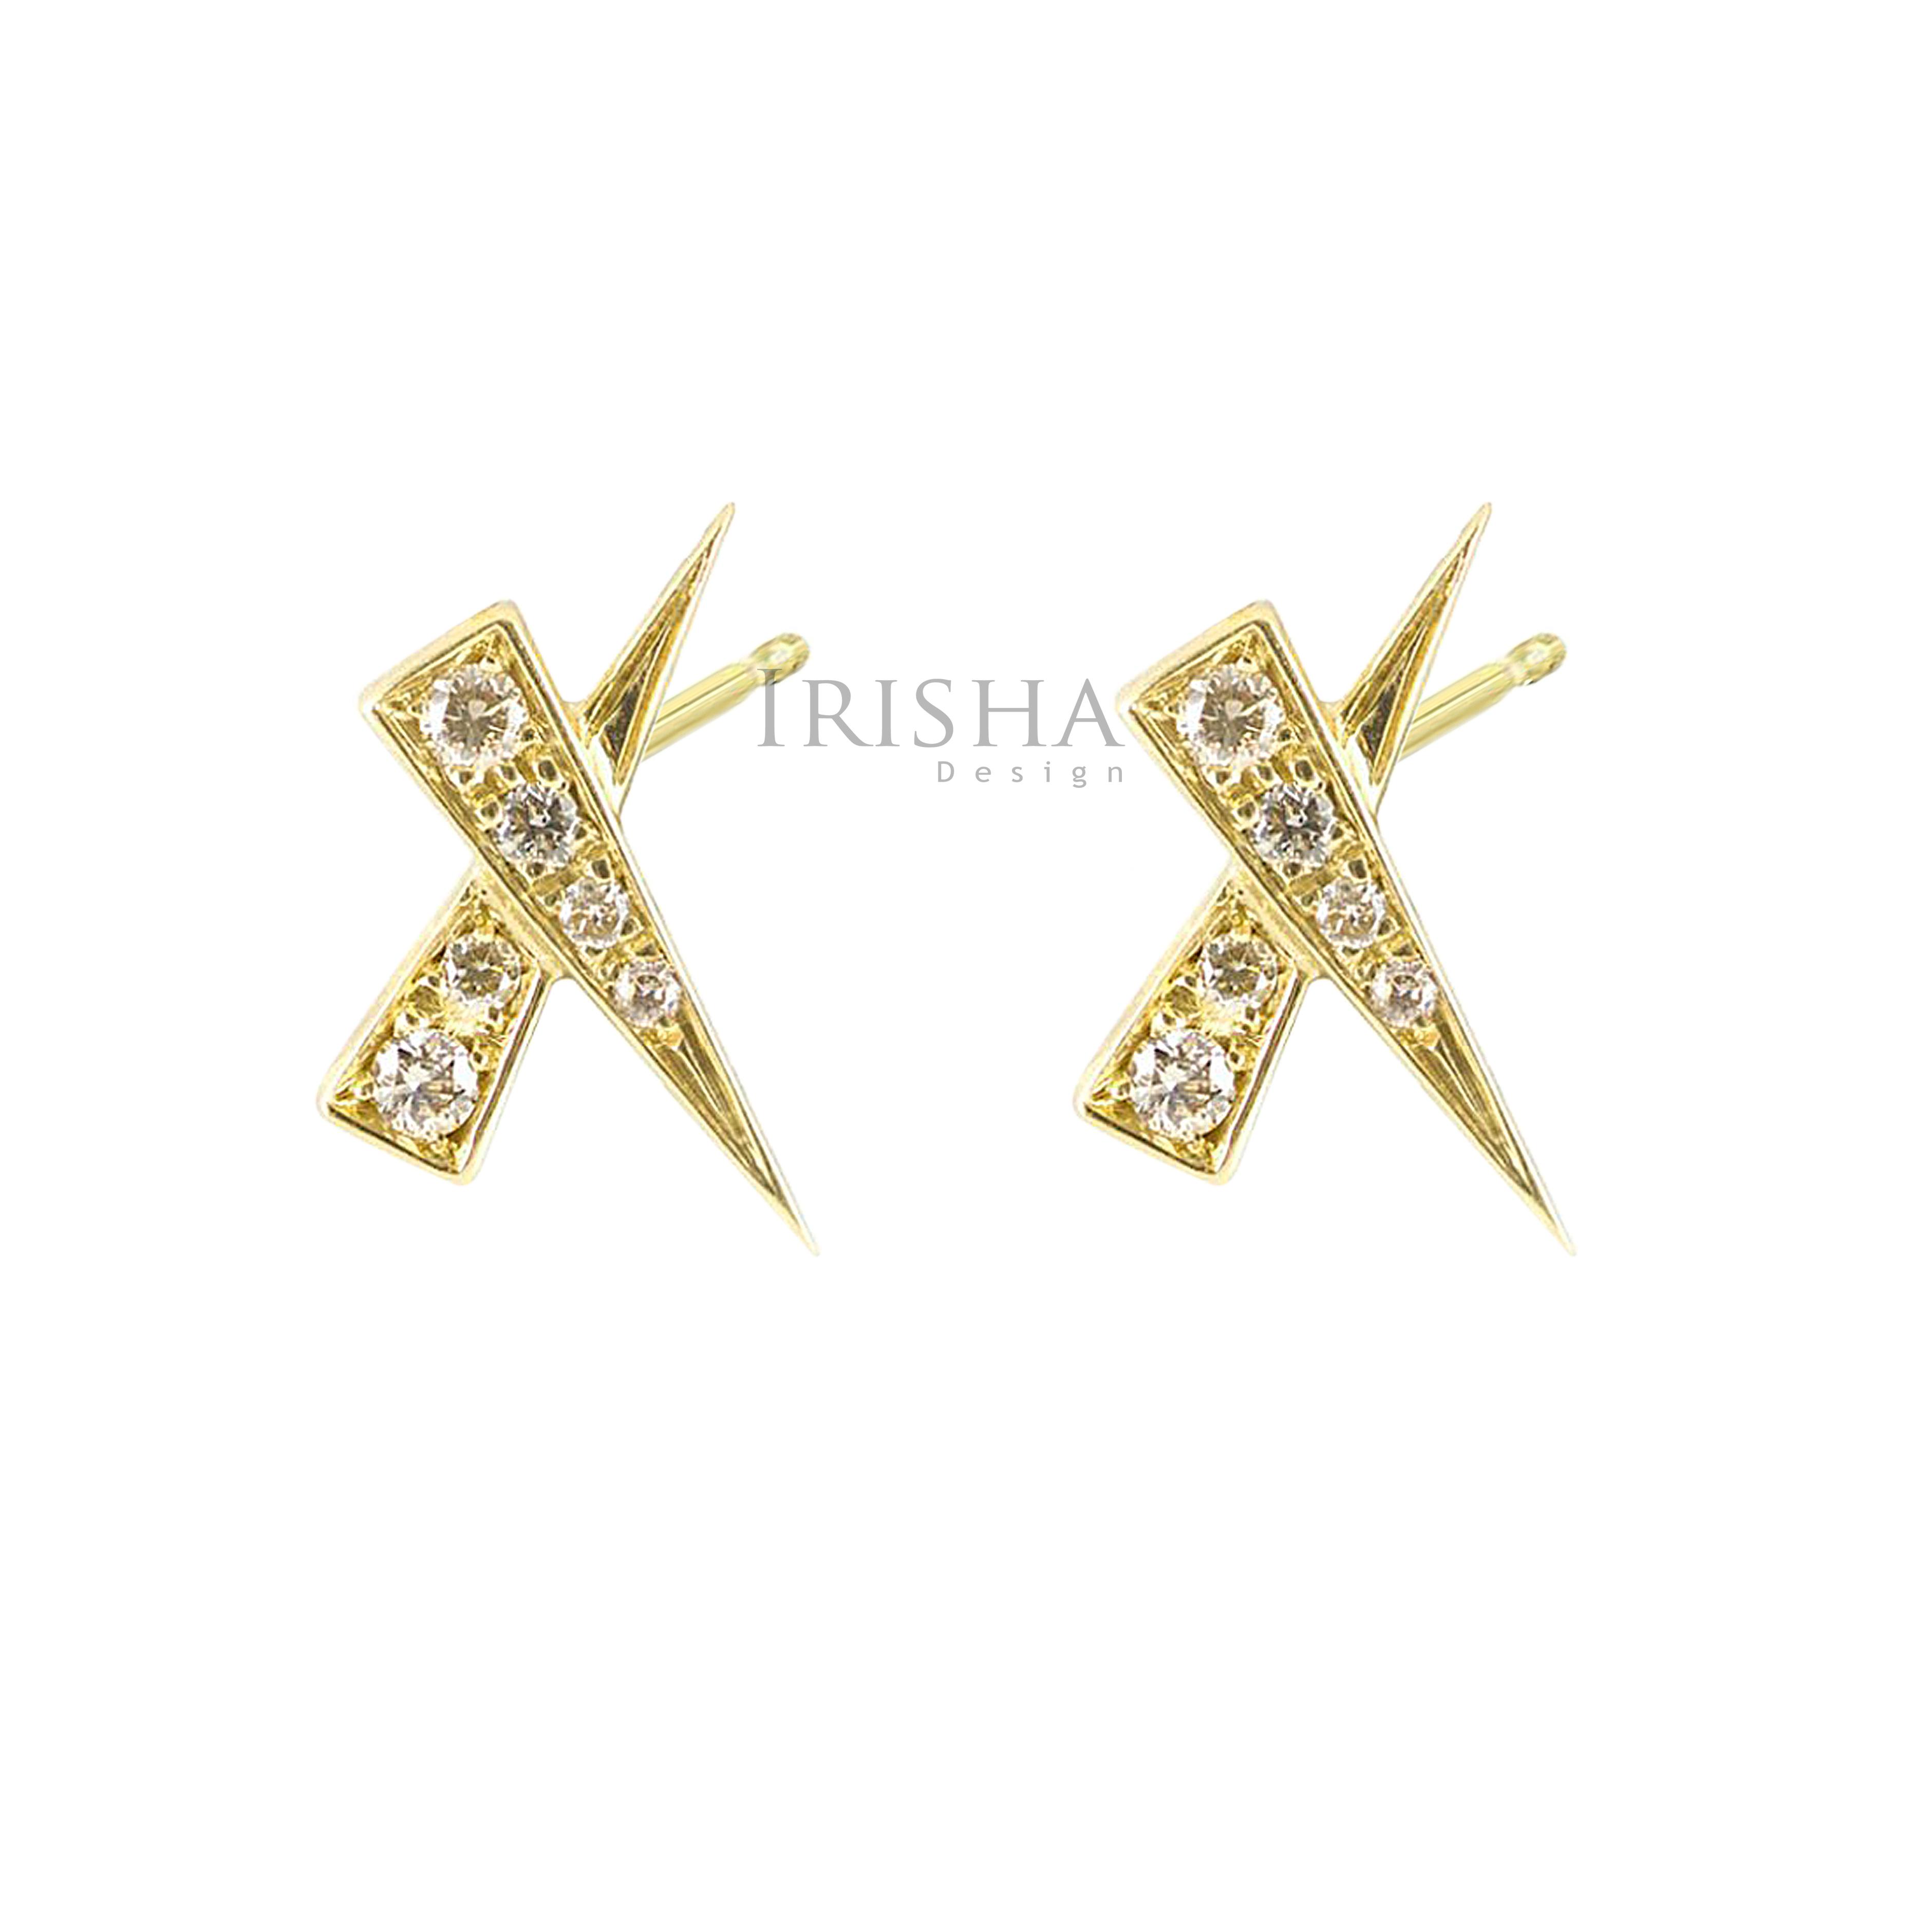 14K Gold 0.07 Ct. Genuine Diamond Kiss Studs Earrings Fine Jewelry - New Arrival